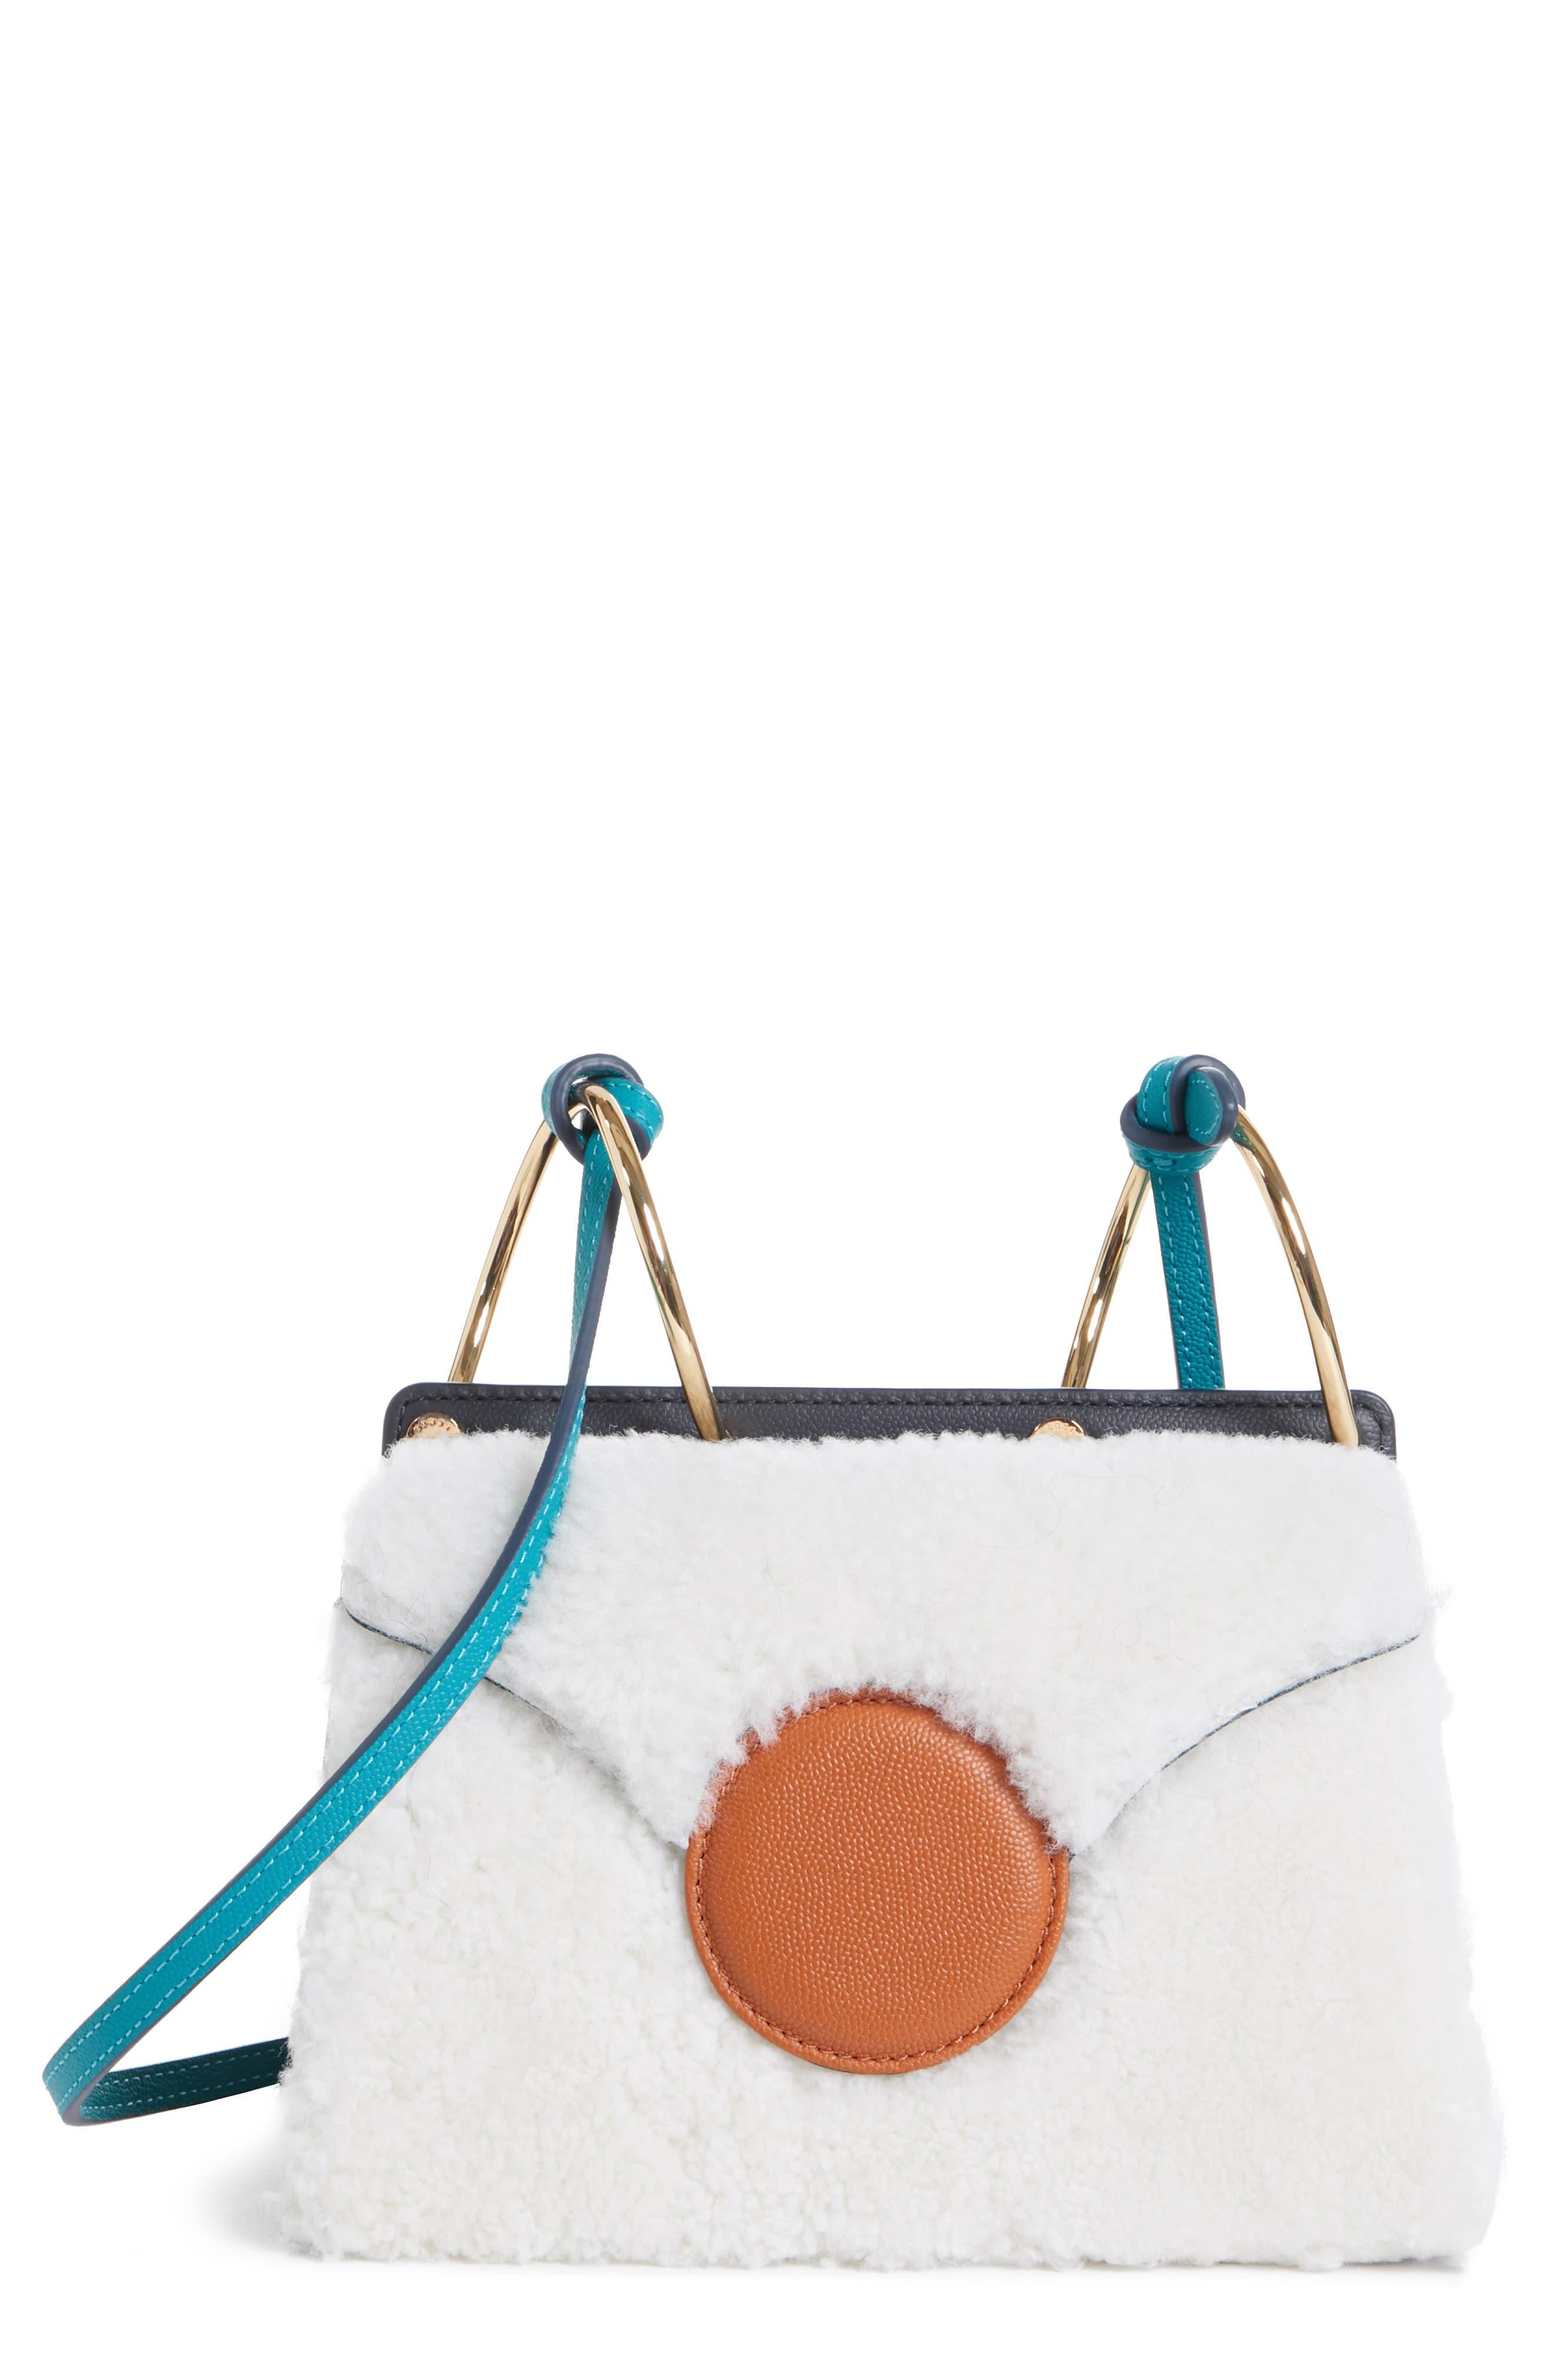 Mini Phoebe Leather Bag,                             Main thumbnail 1, color,                             CURLY SHEARLING WHITE-MARINE